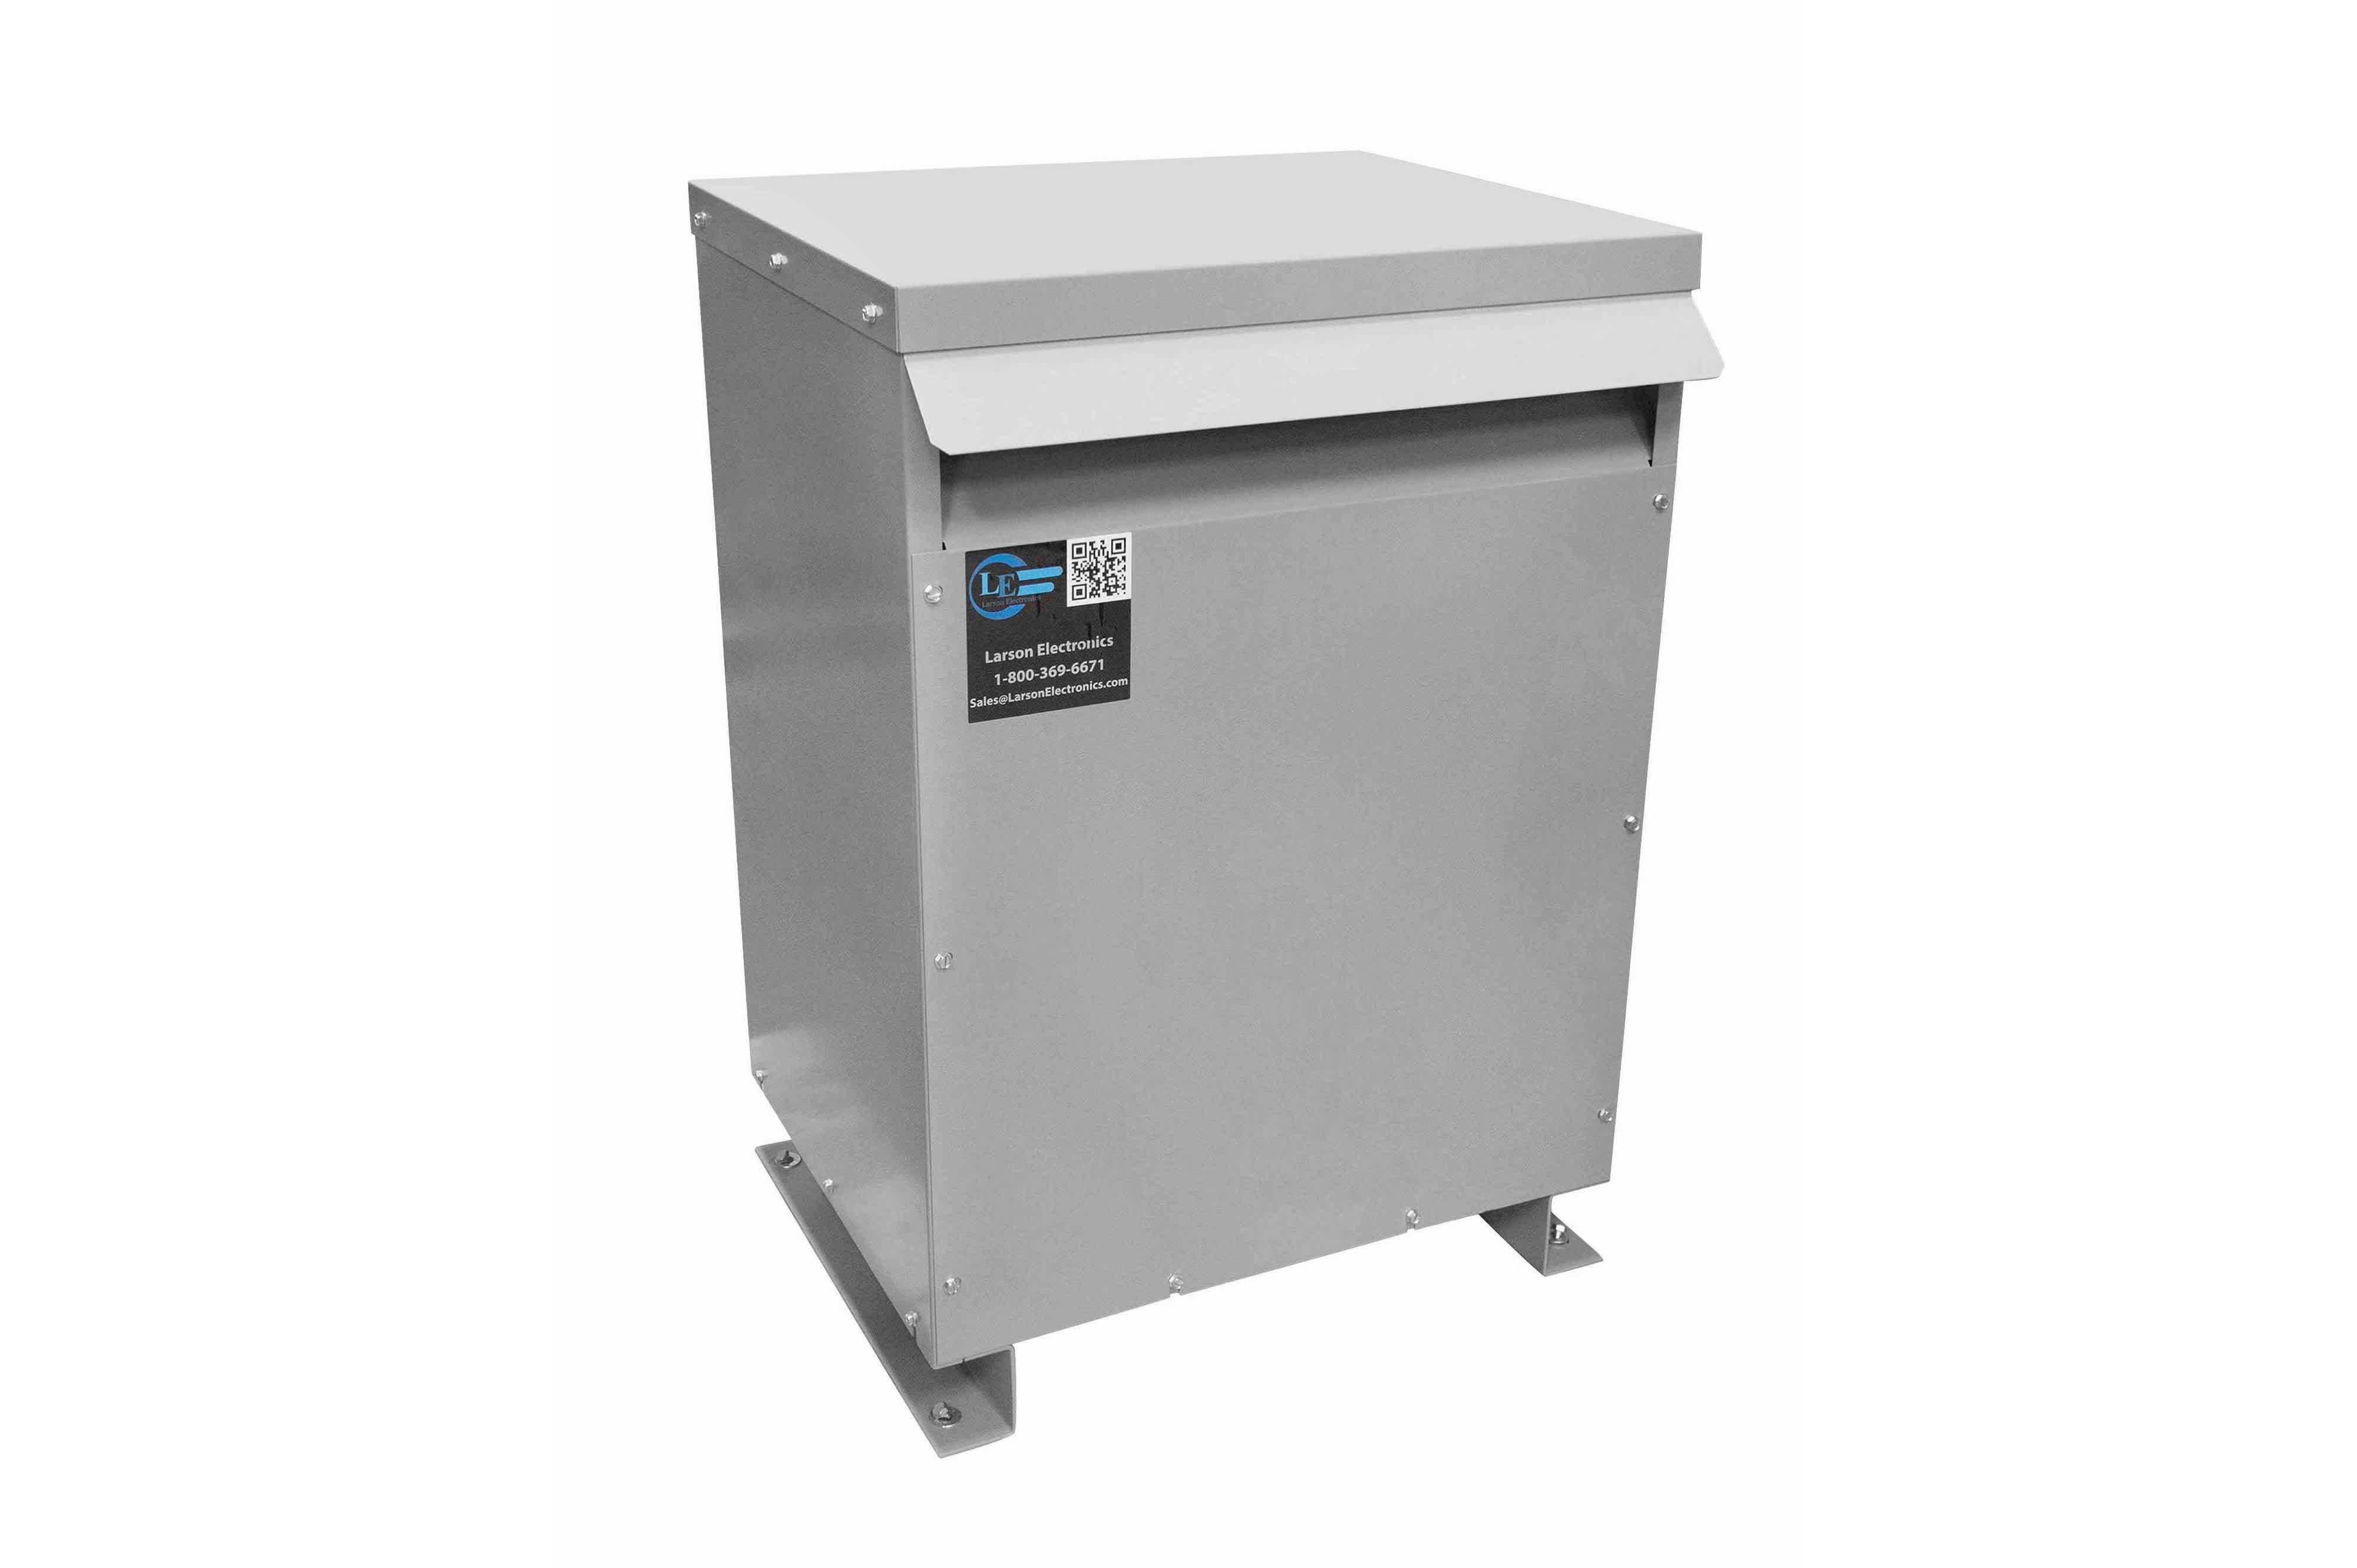 750 kVA 3PH Isolation Transformer, 600V Wye Primary, 480V Delta Secondary, N3R, Ventilated, 60 Hz